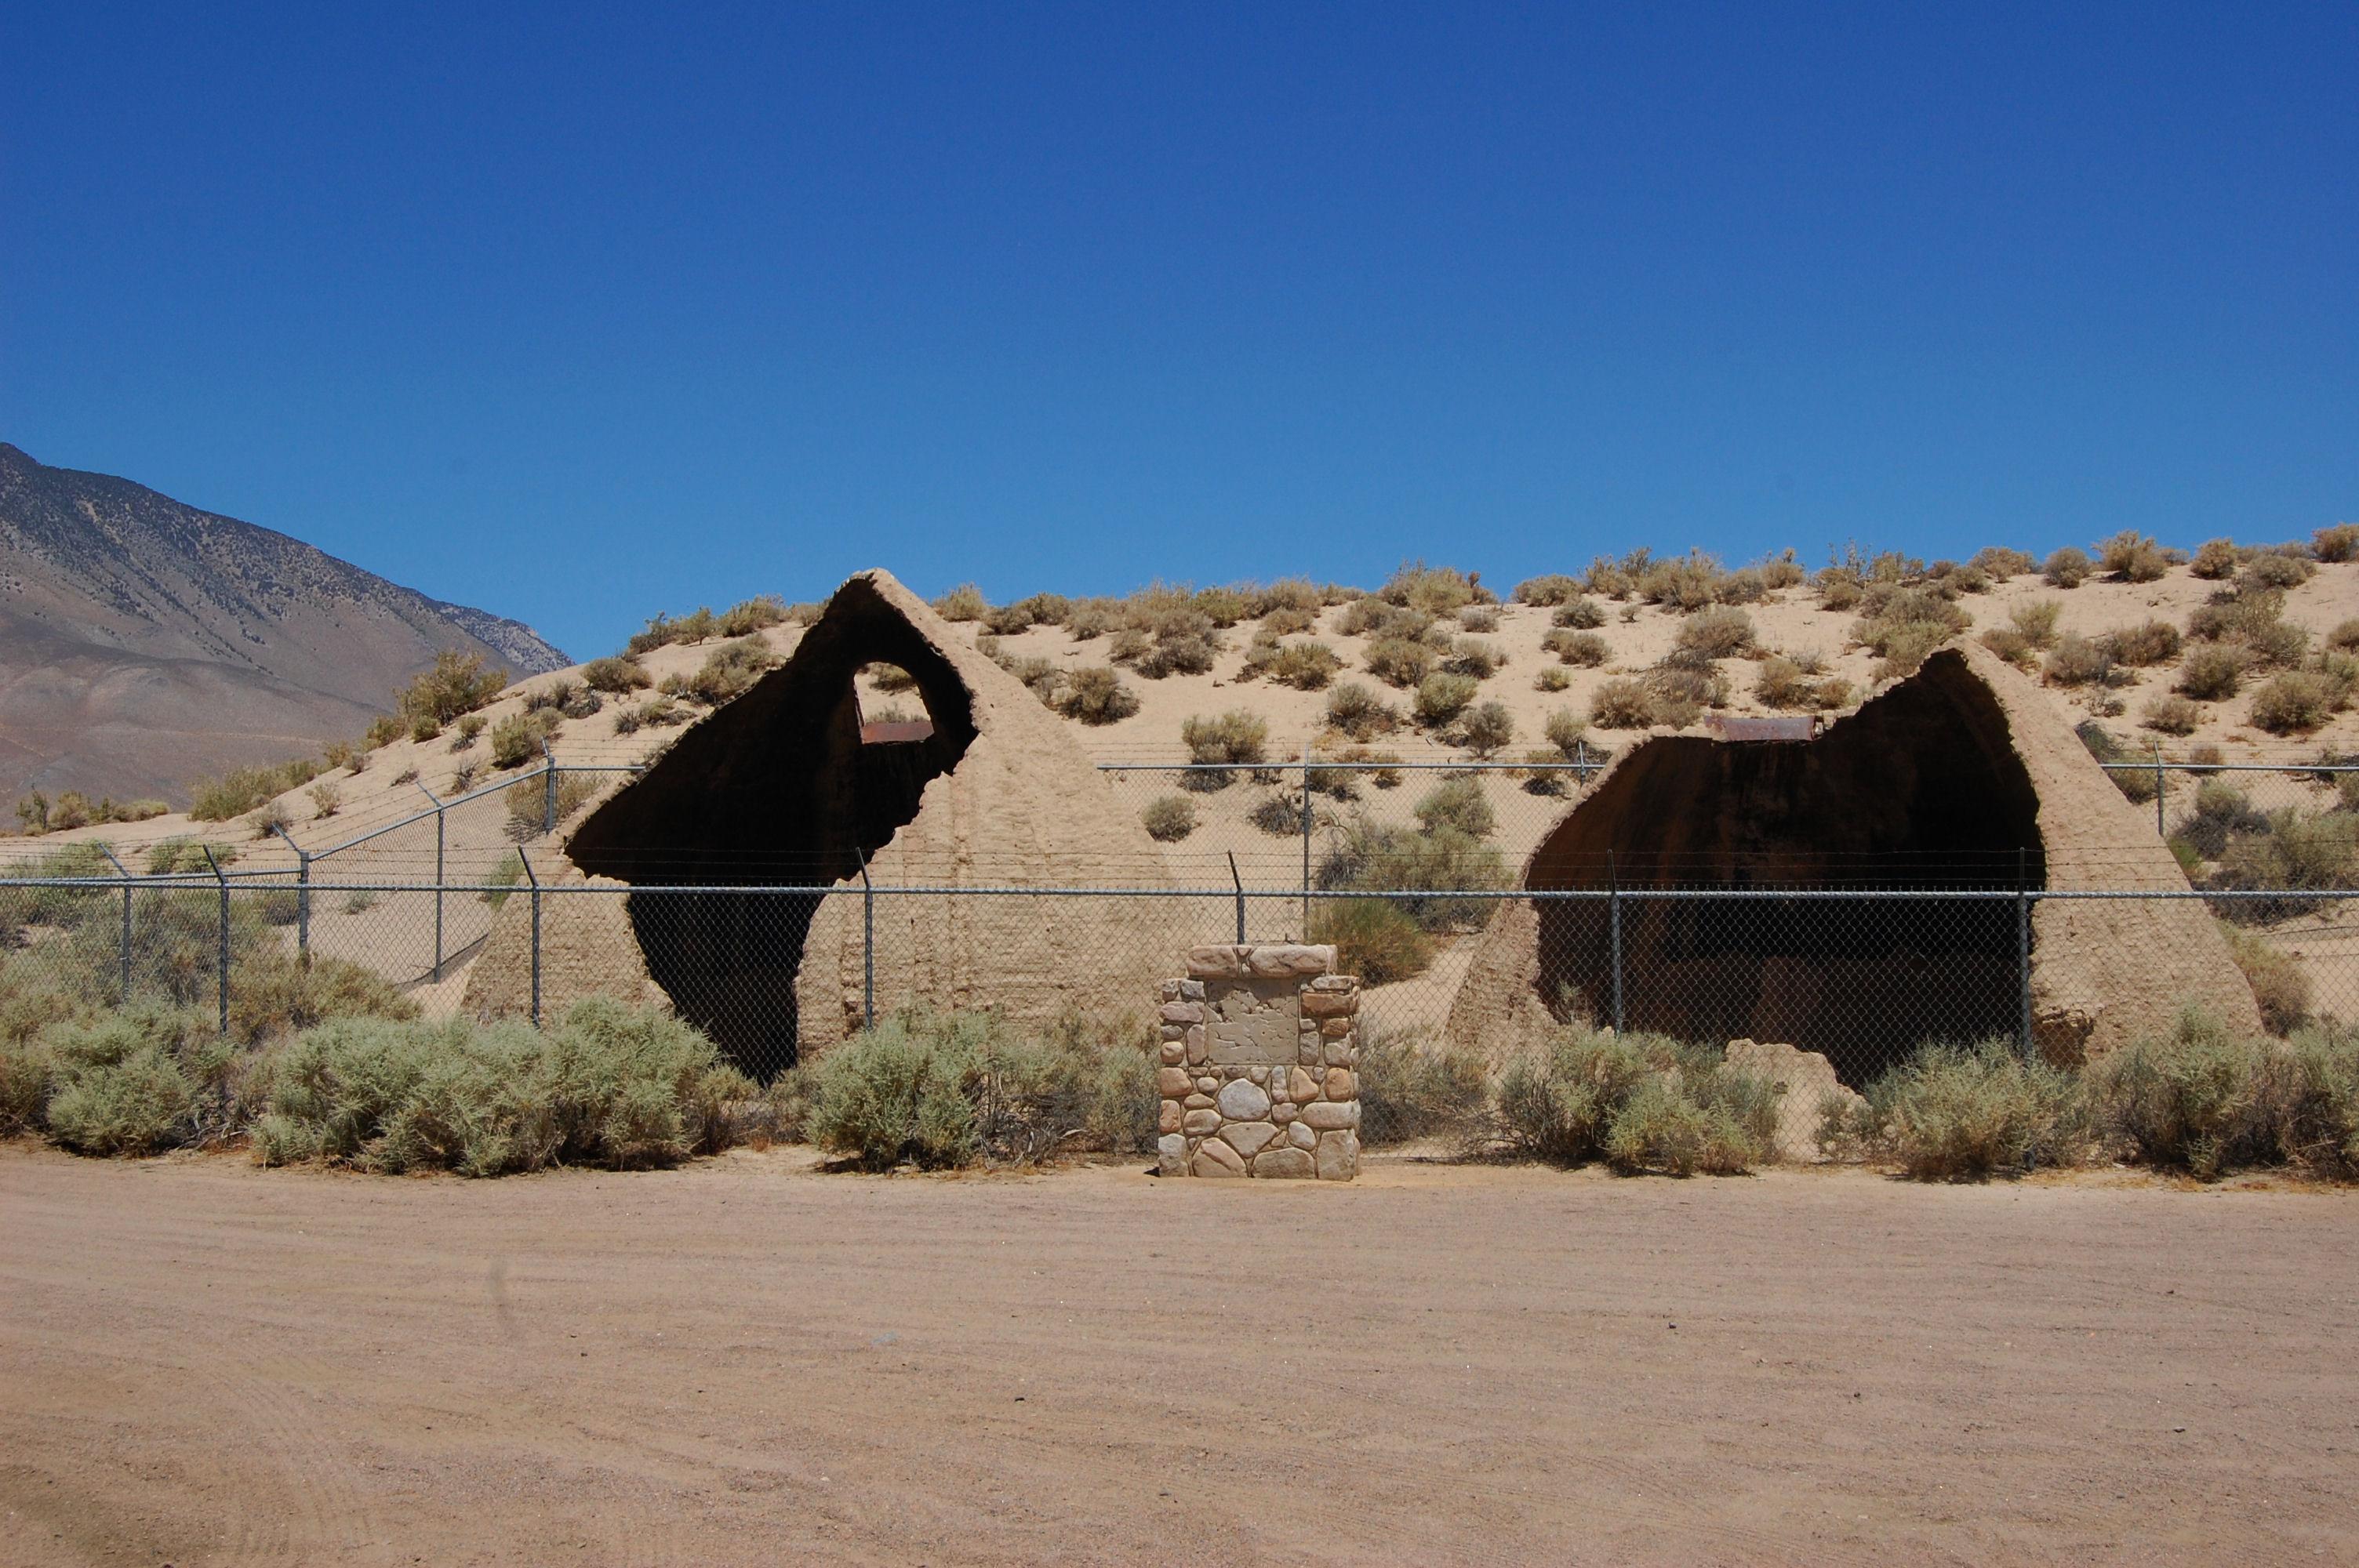 http://upload.wikimedia.org/wikipedia/commons/8/80/Cottonwood_Charcoal_Kilns.jpg